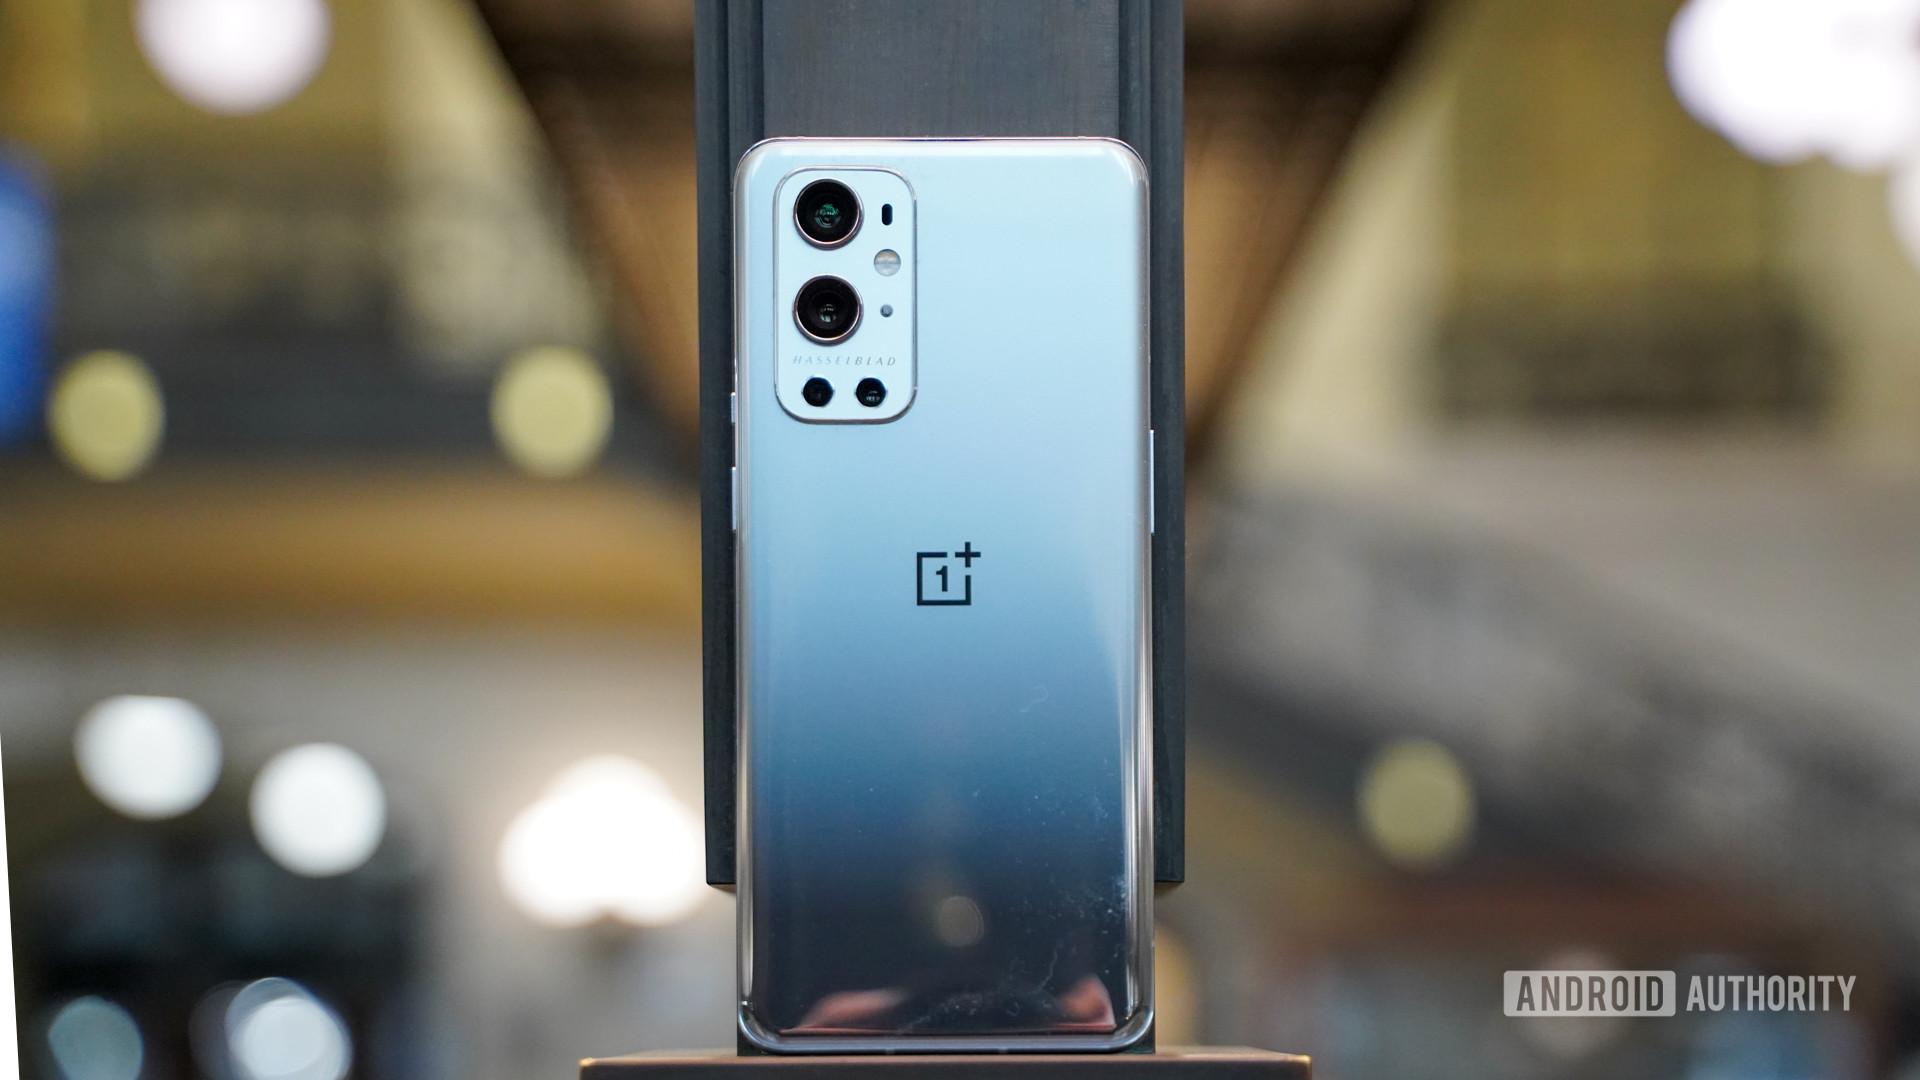 OnePlus 9 Pro rear profile